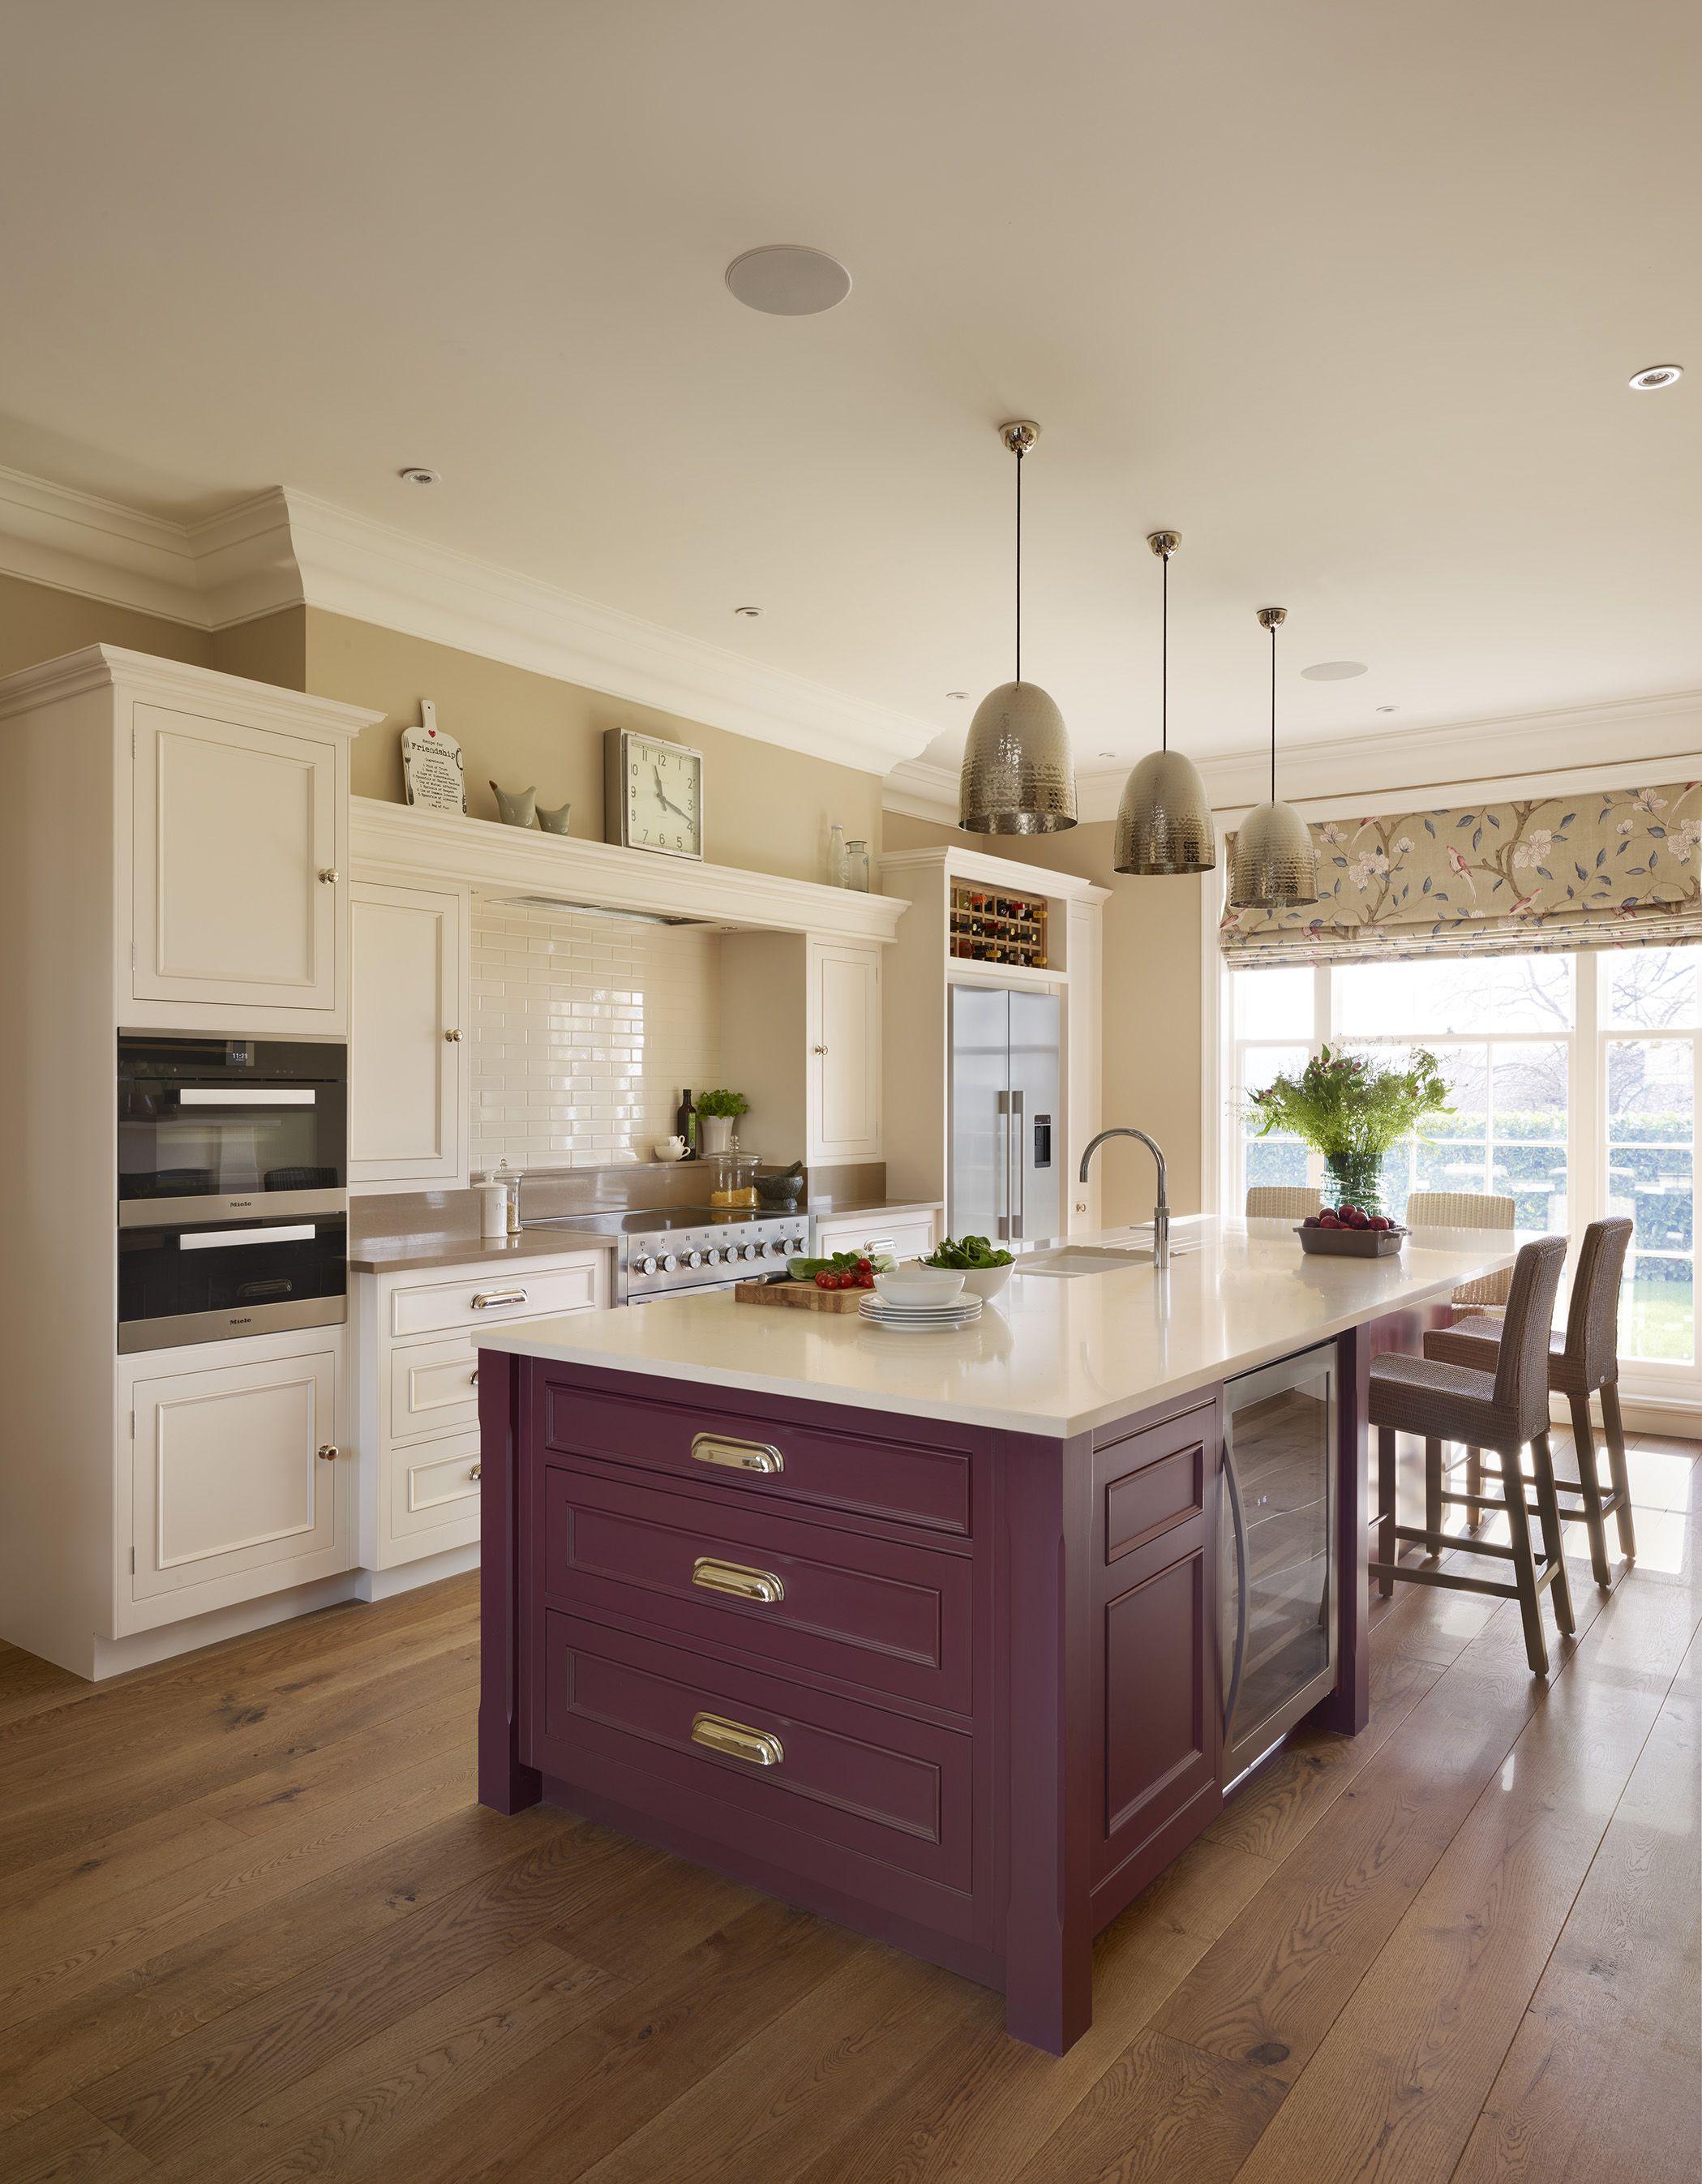 A Harvey Jones handmade, handpainted Original kitchen, designed by our Tunbridge Wells showroom. #kitchendesign